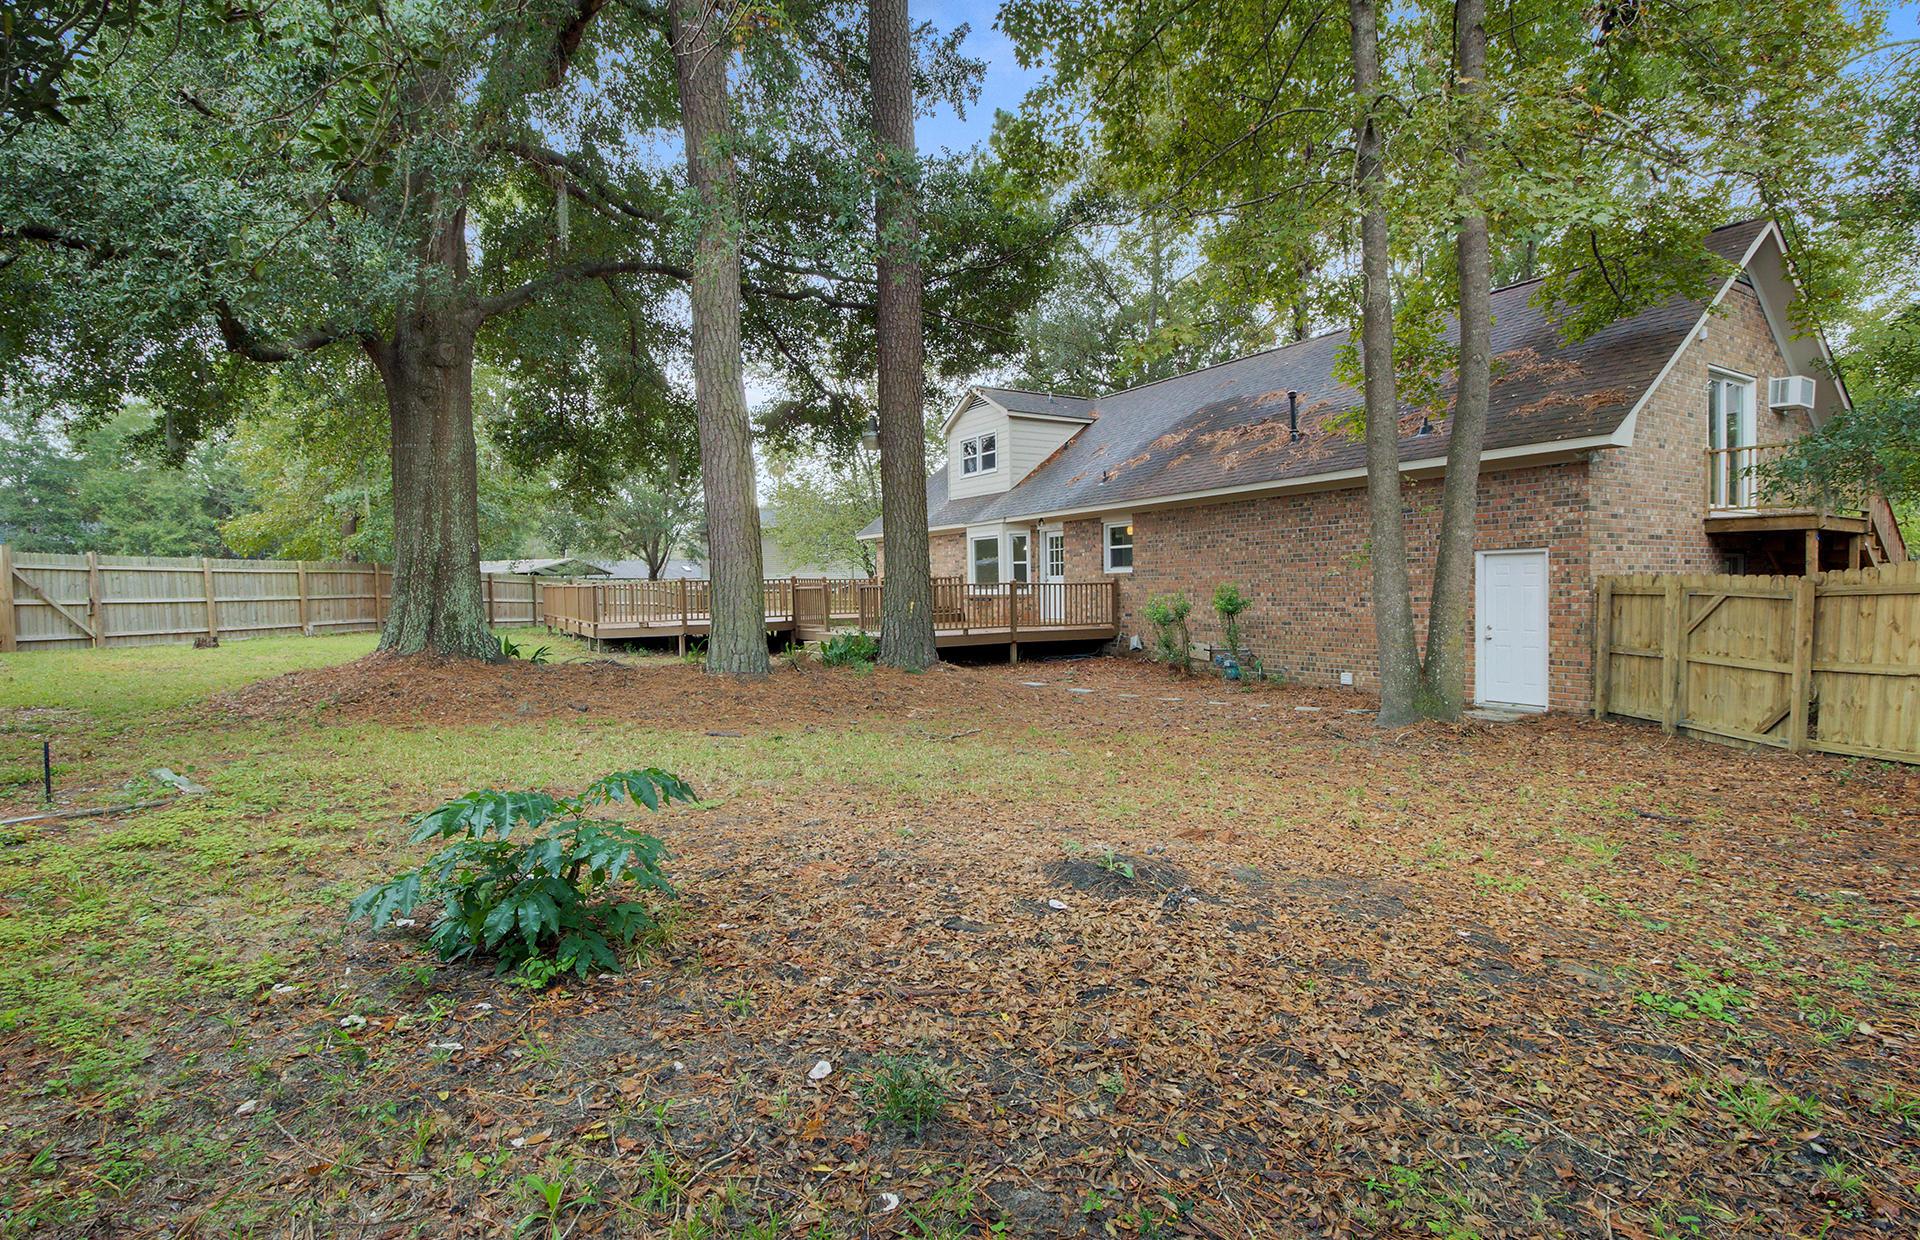 White Church Place Homes For Sale - 208 Glebe, Summerville, SC - 16